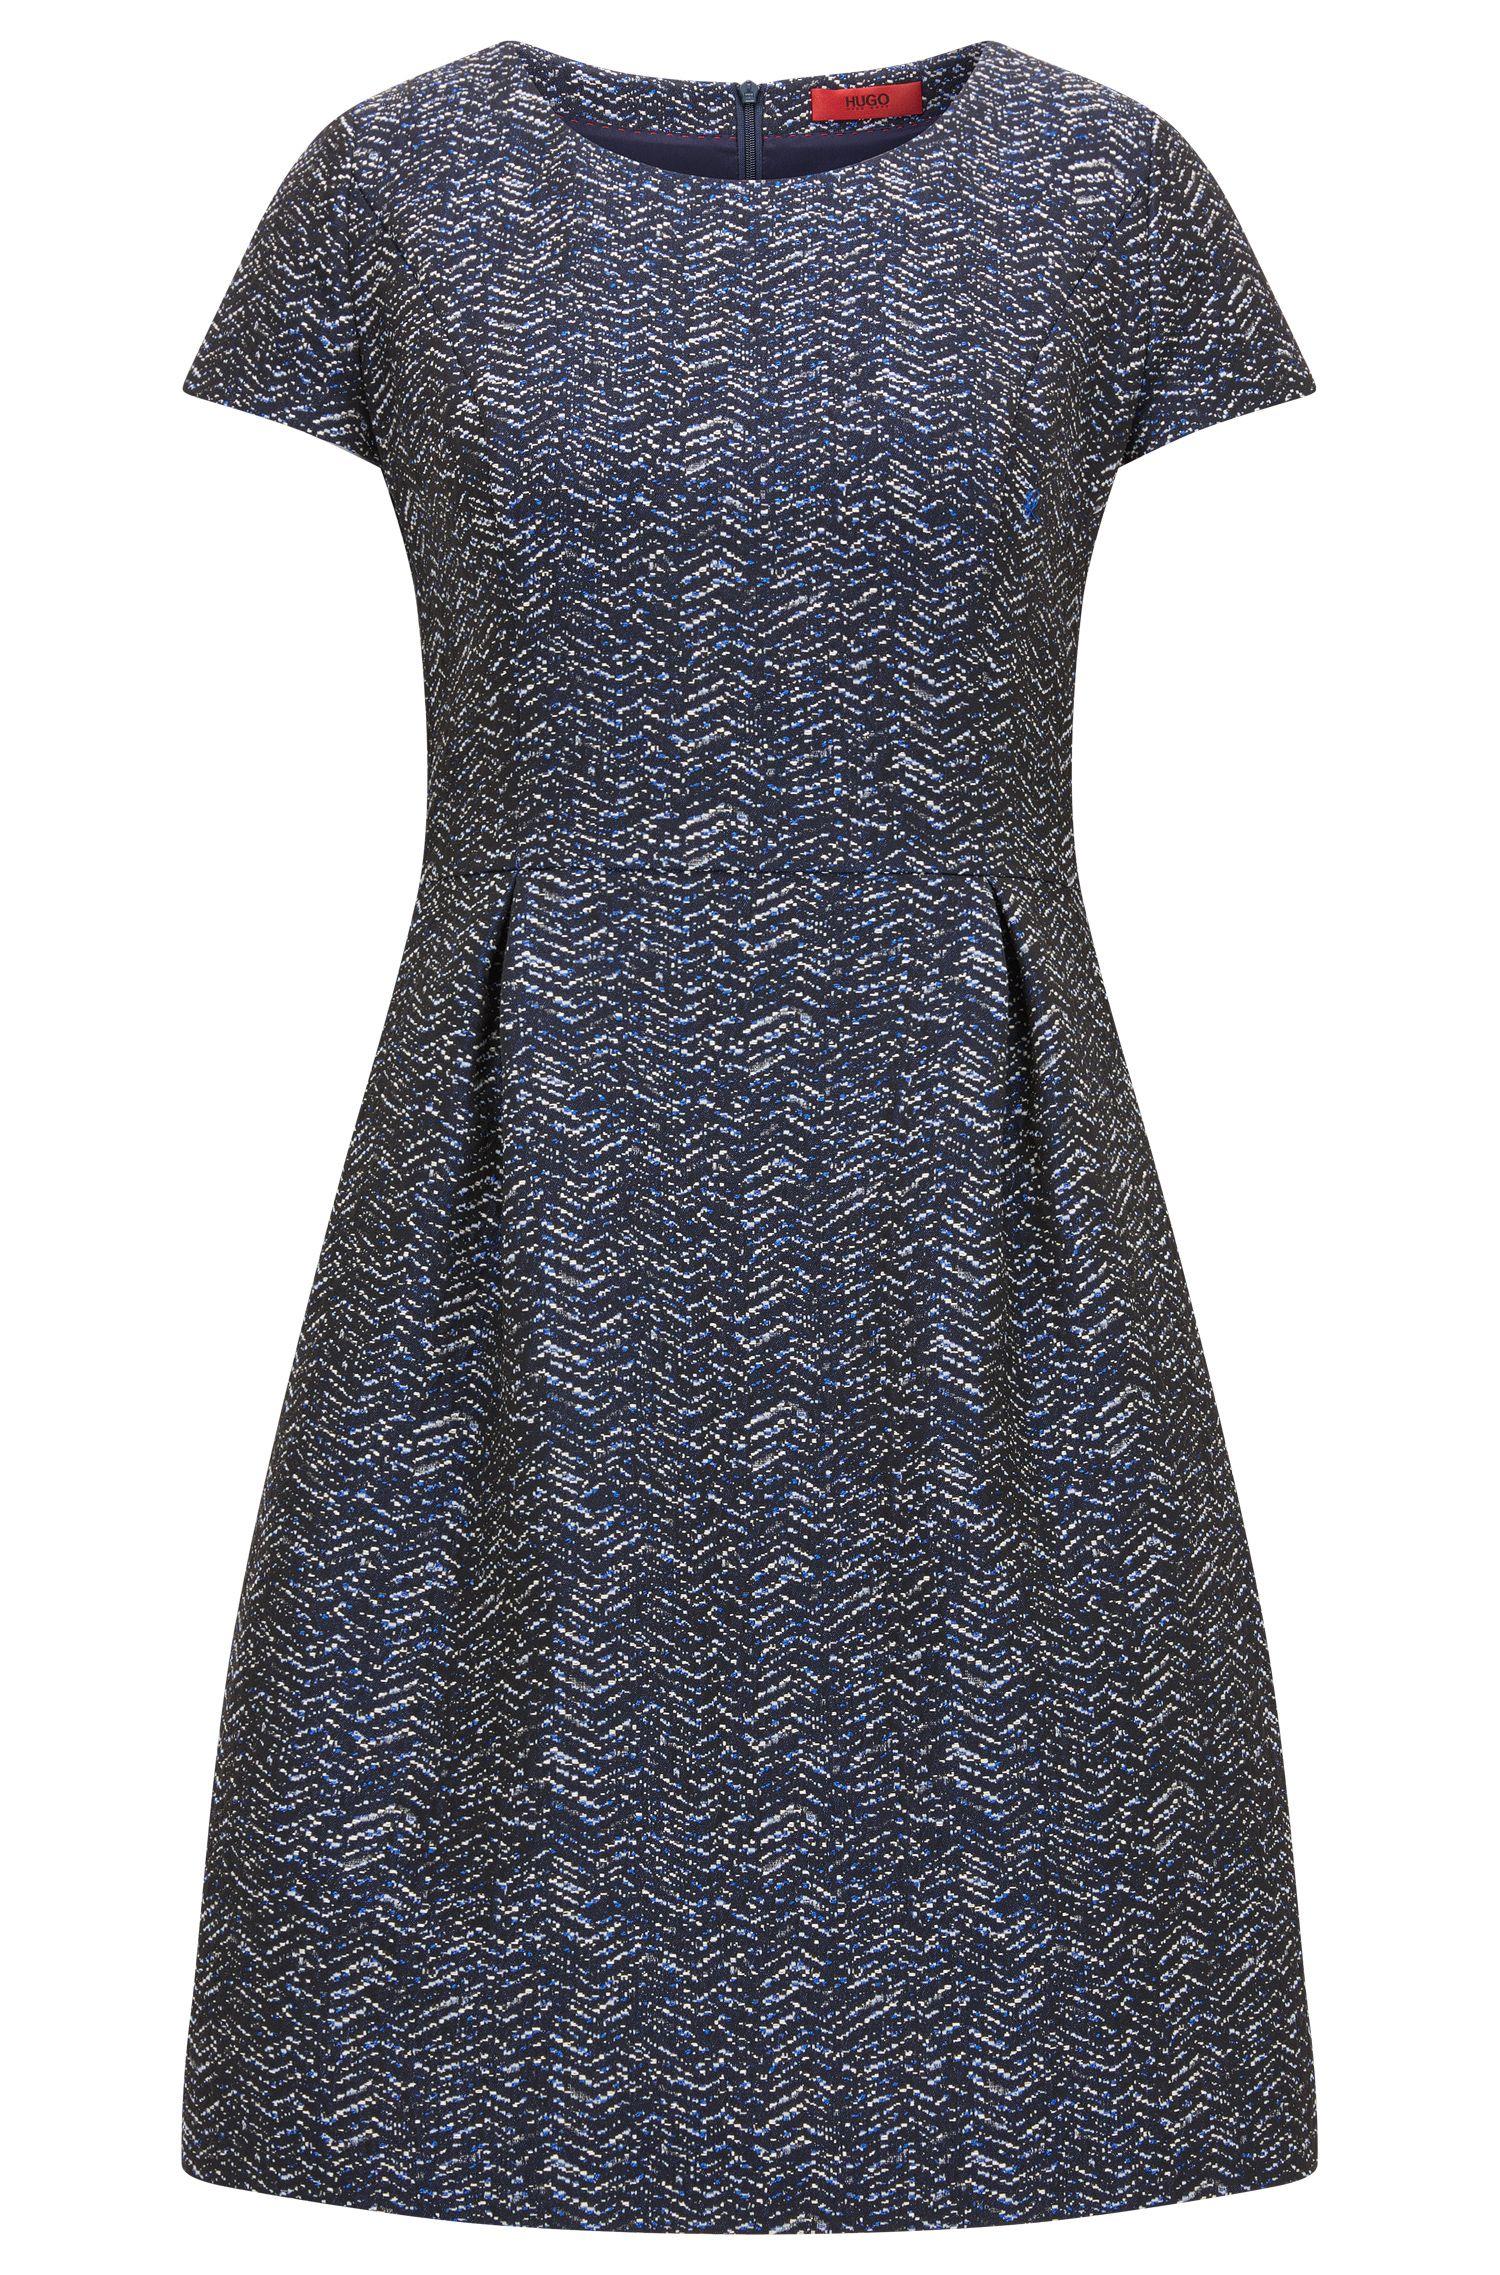 Short-sleeved dress in zig zag jacquard